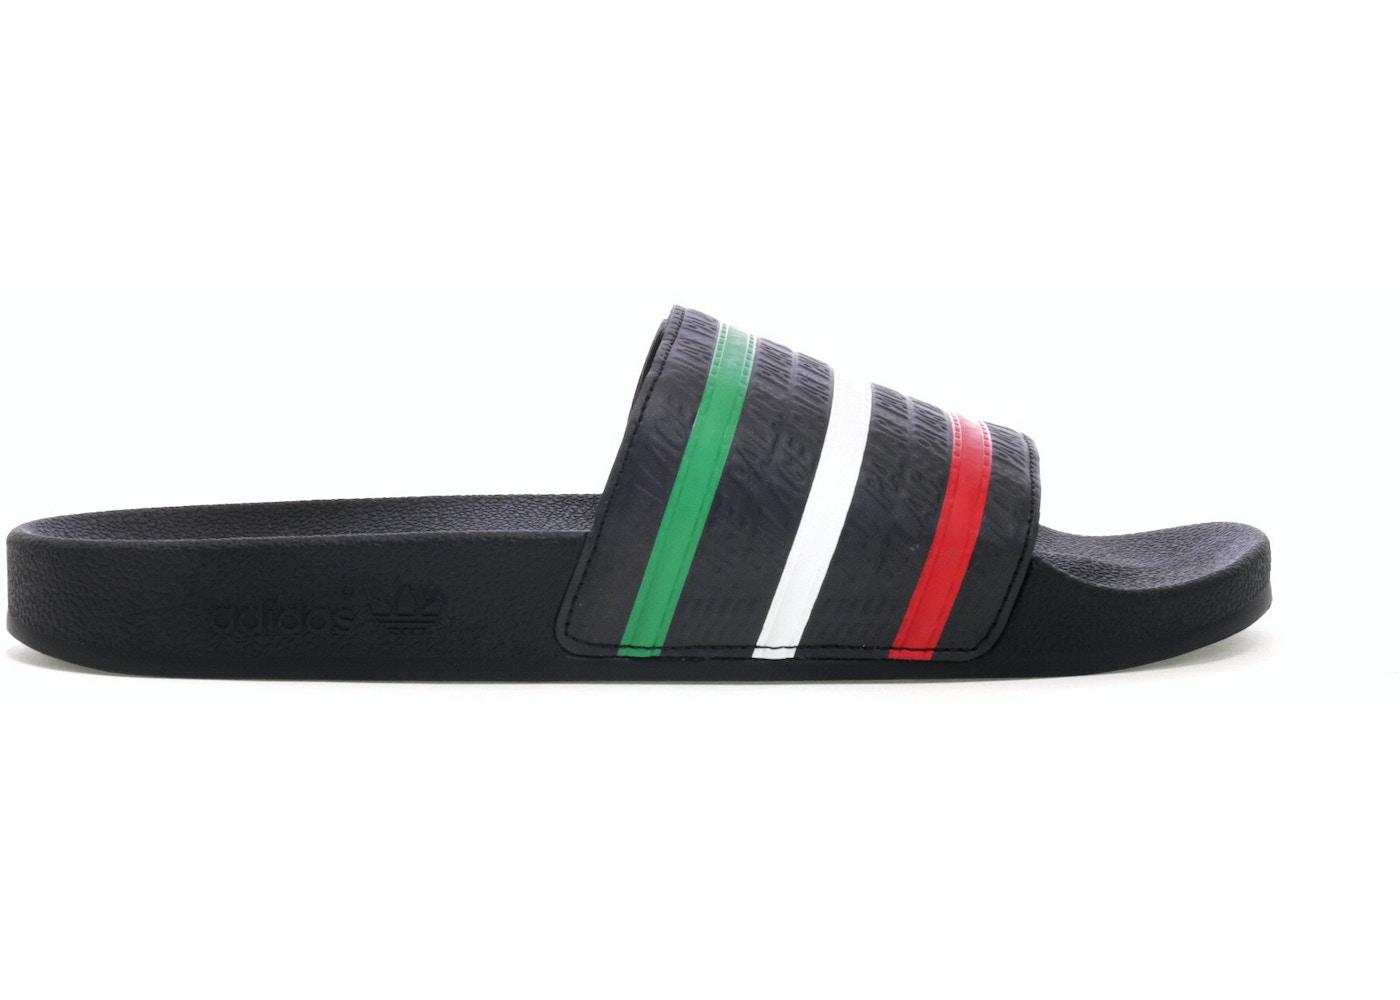 91b629f1 adidas Adilette Slides - B41582